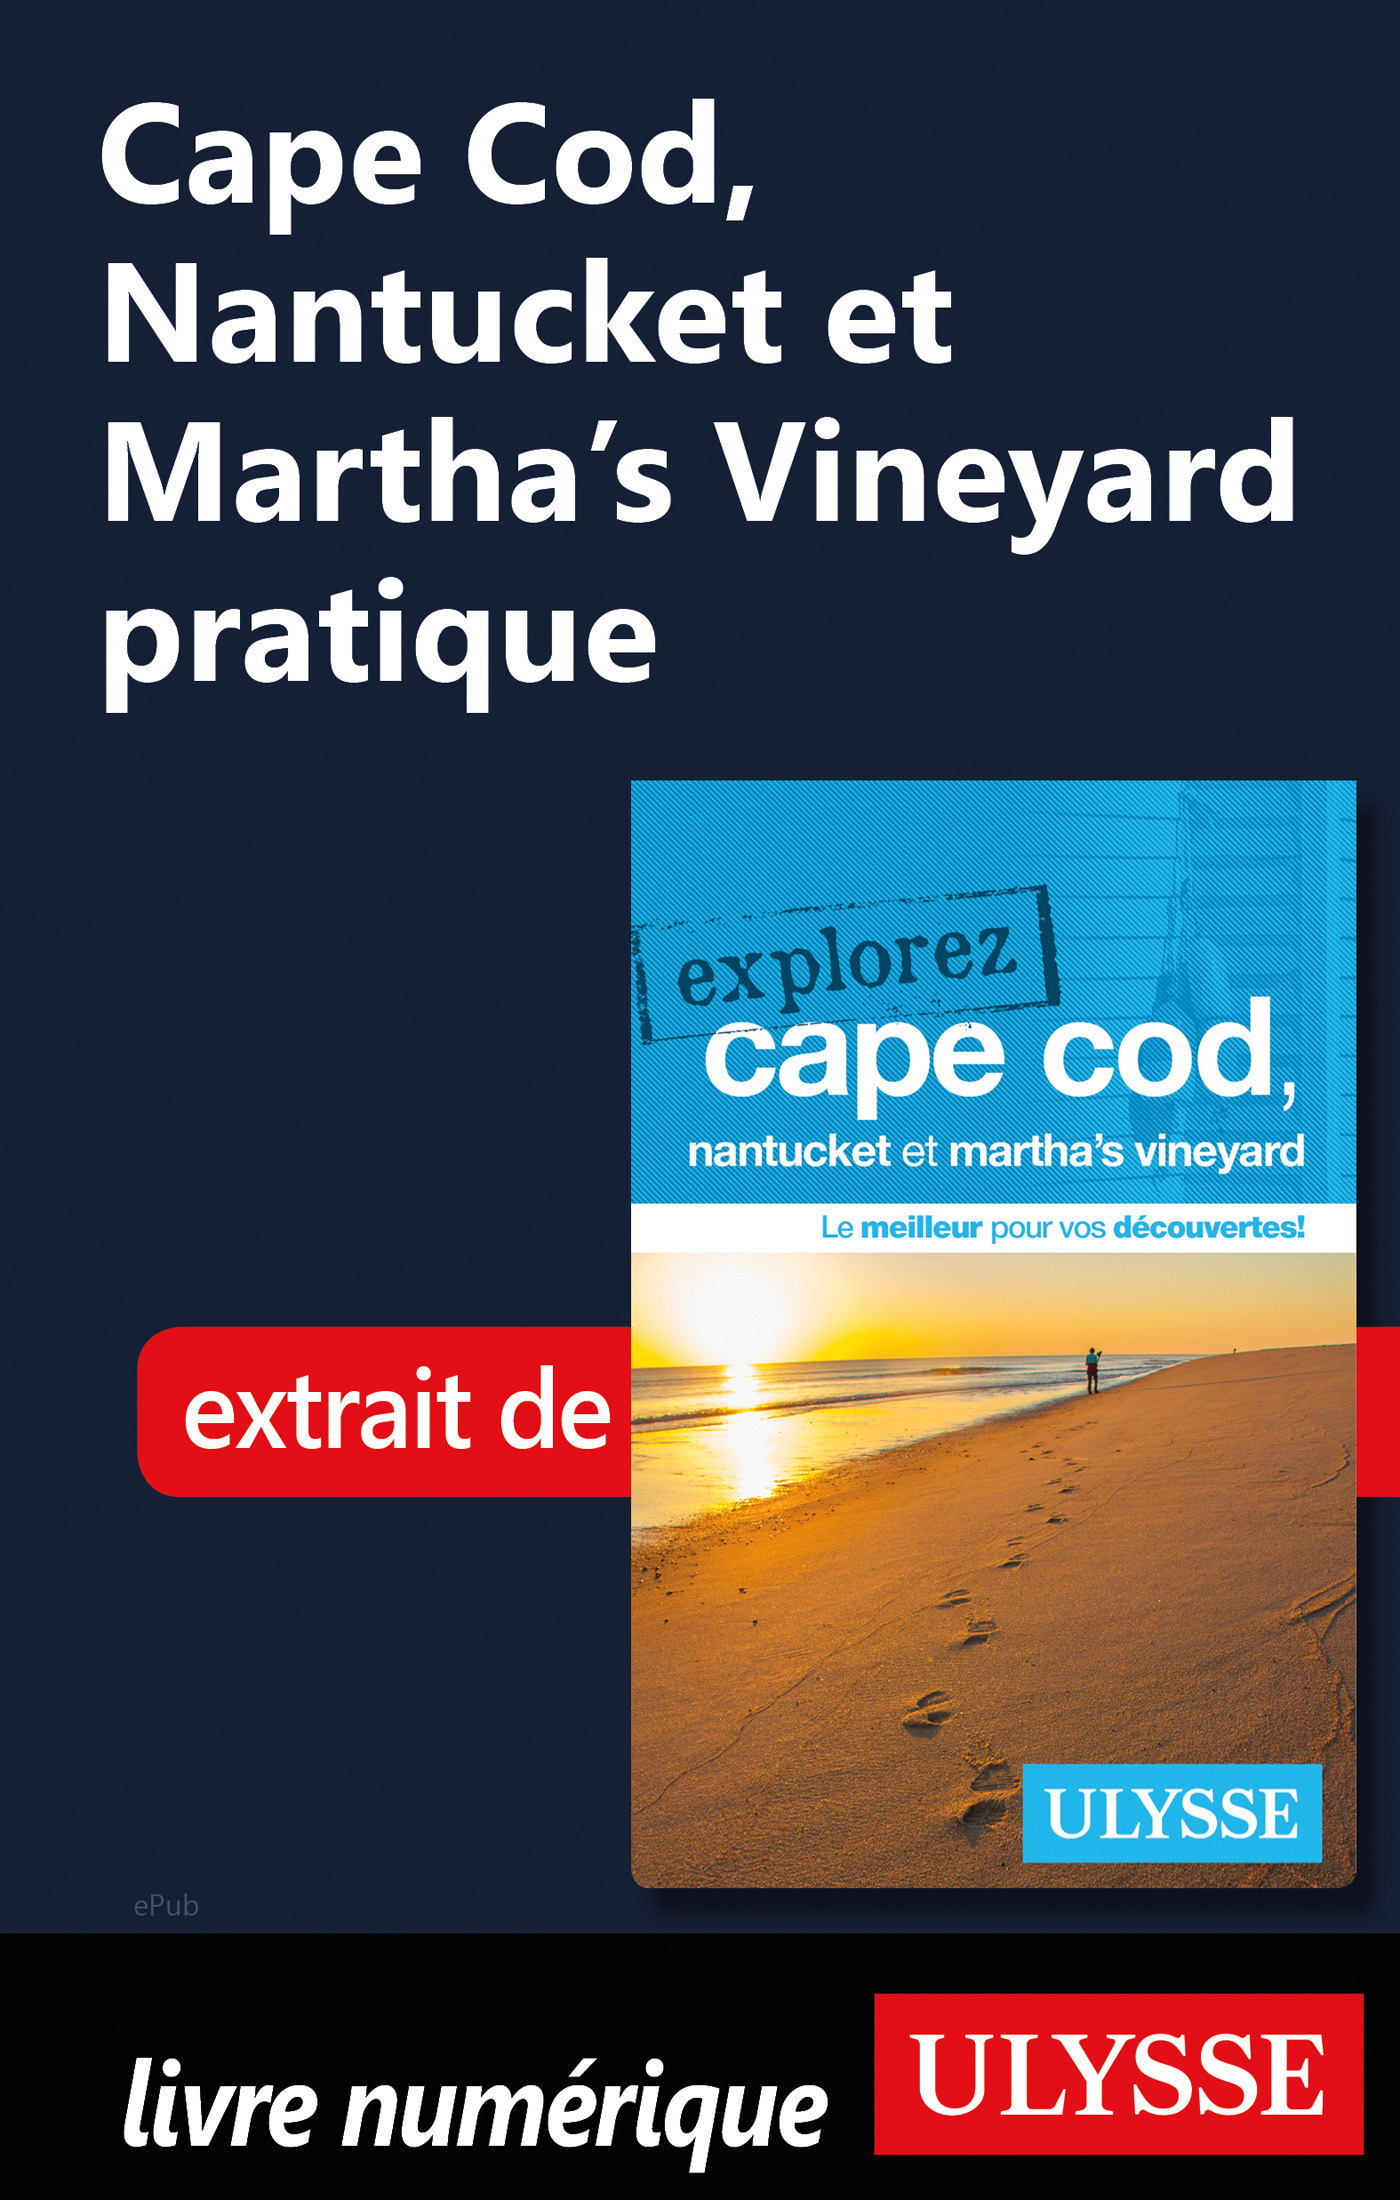 Cape Cod, Nantucket et Martha's Vineyard pratique